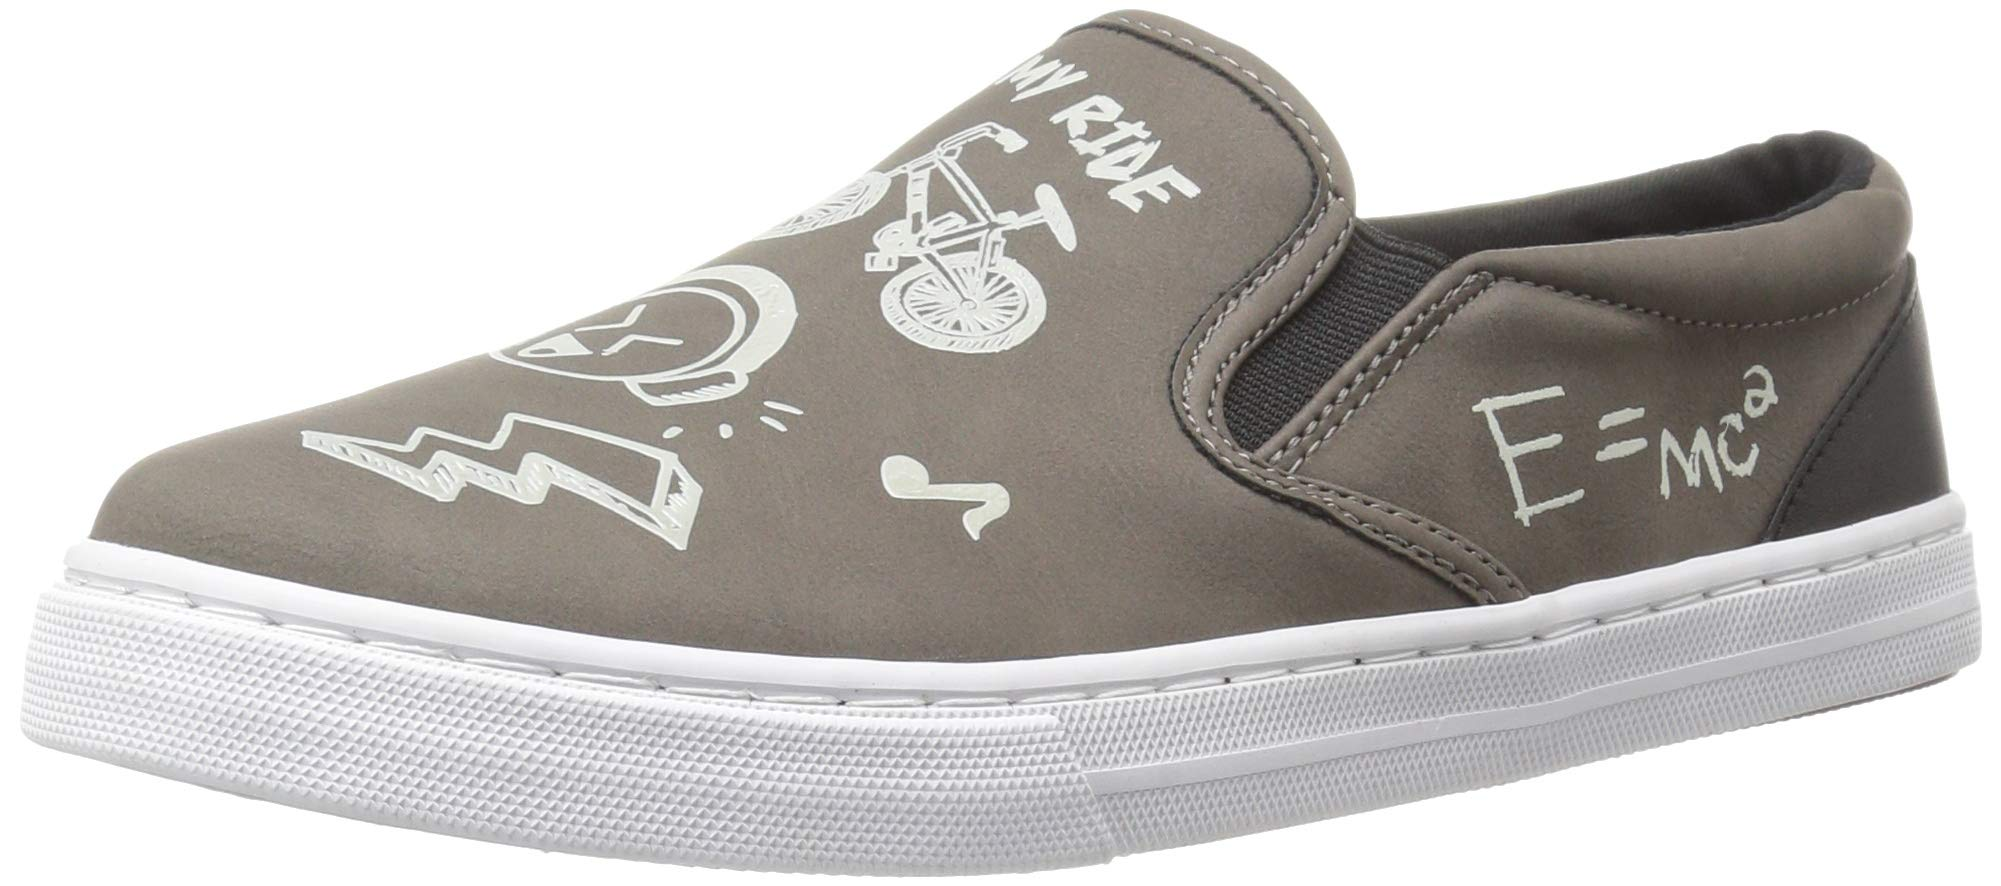 The Children's Place Boys' Slip Sneaker, Nordic Gray, Youth 11 Child US Little Kid